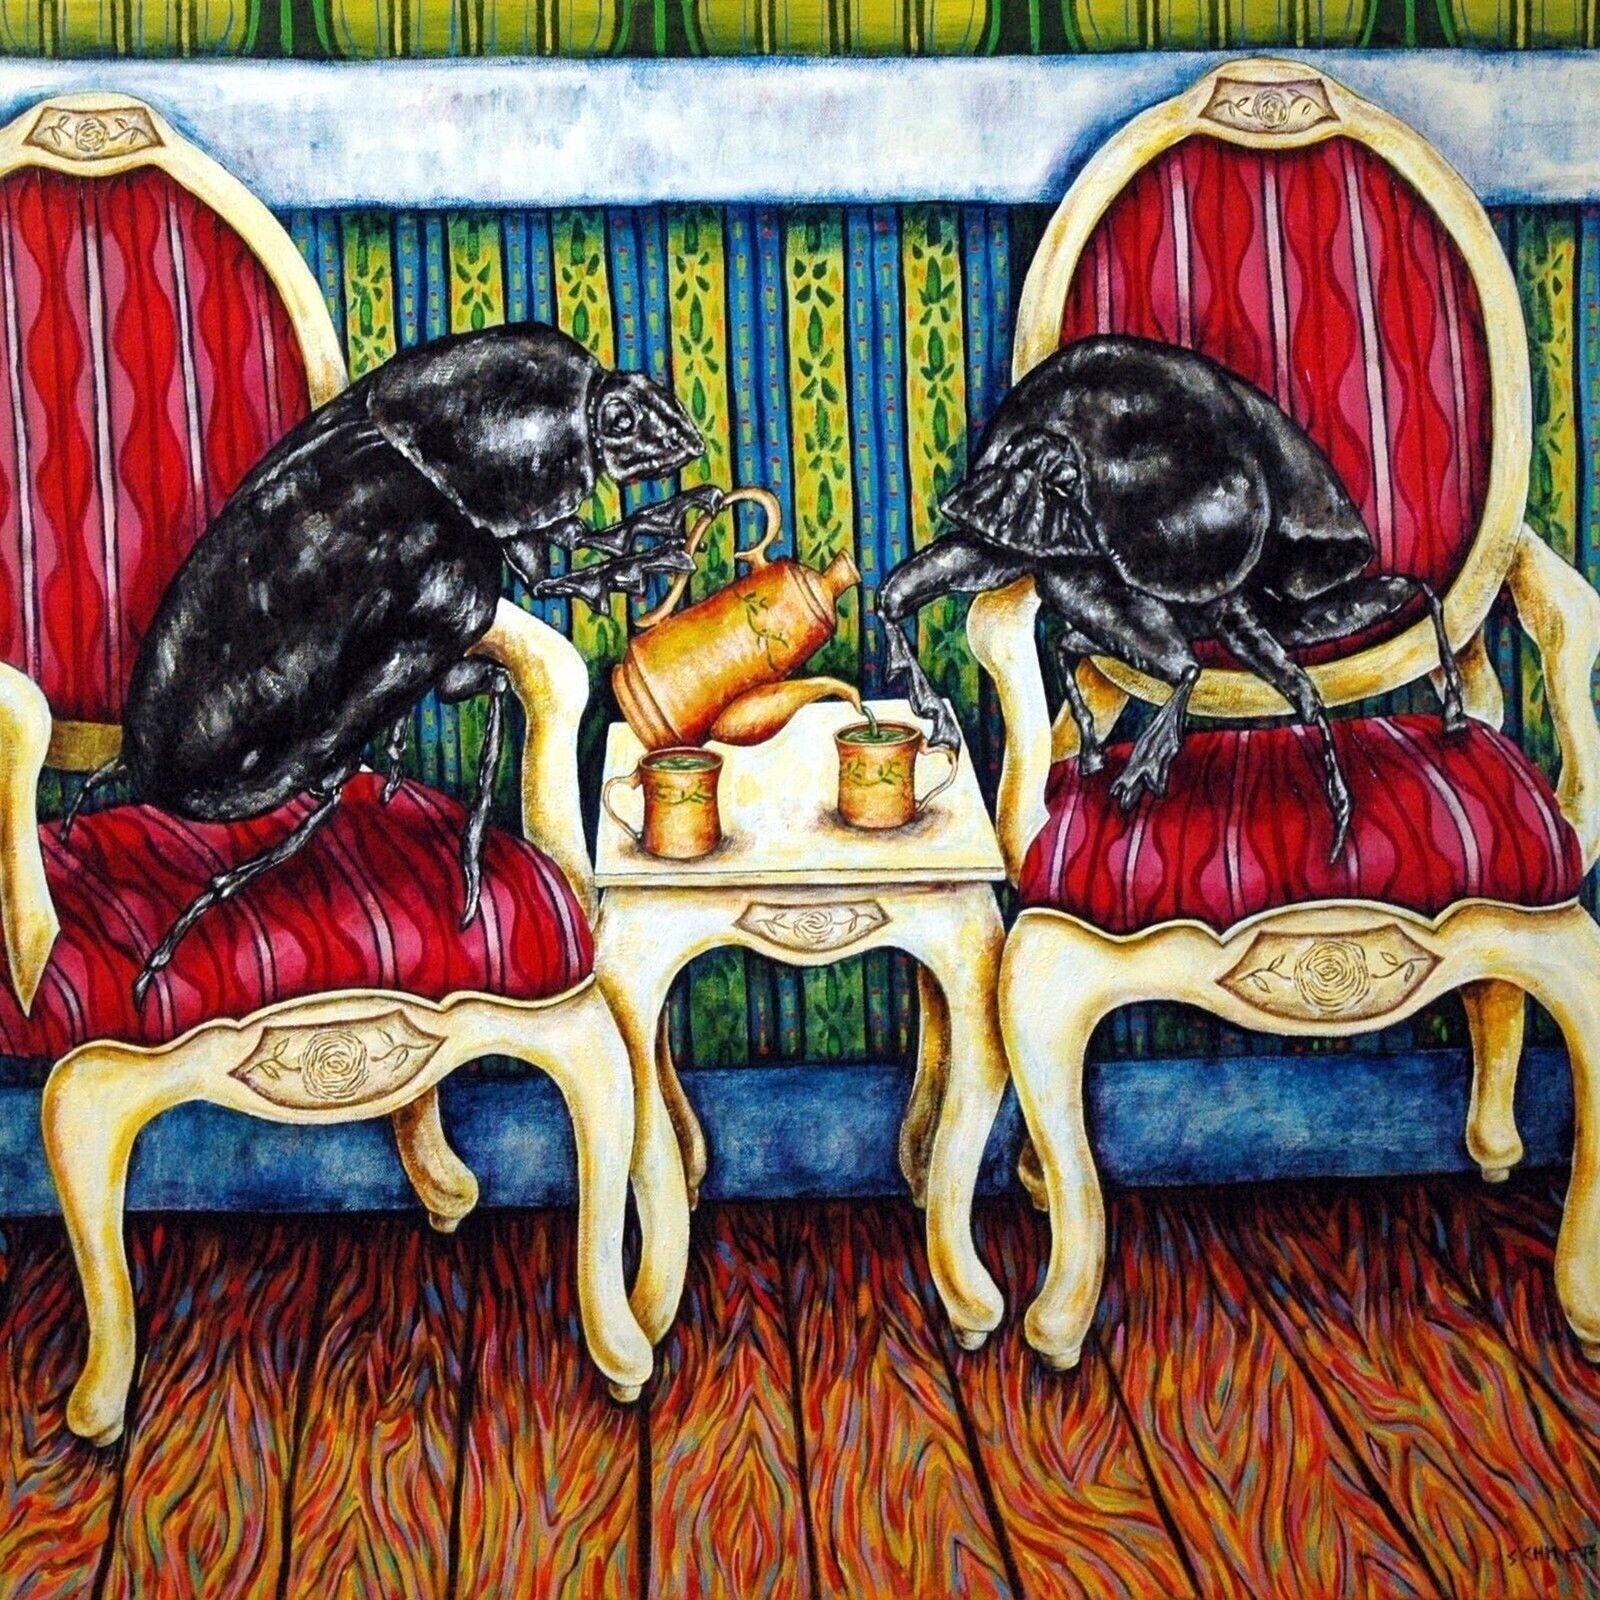 BUTTERFLY tea 4x6 glossy  art PRINT impressionism artist animals gift